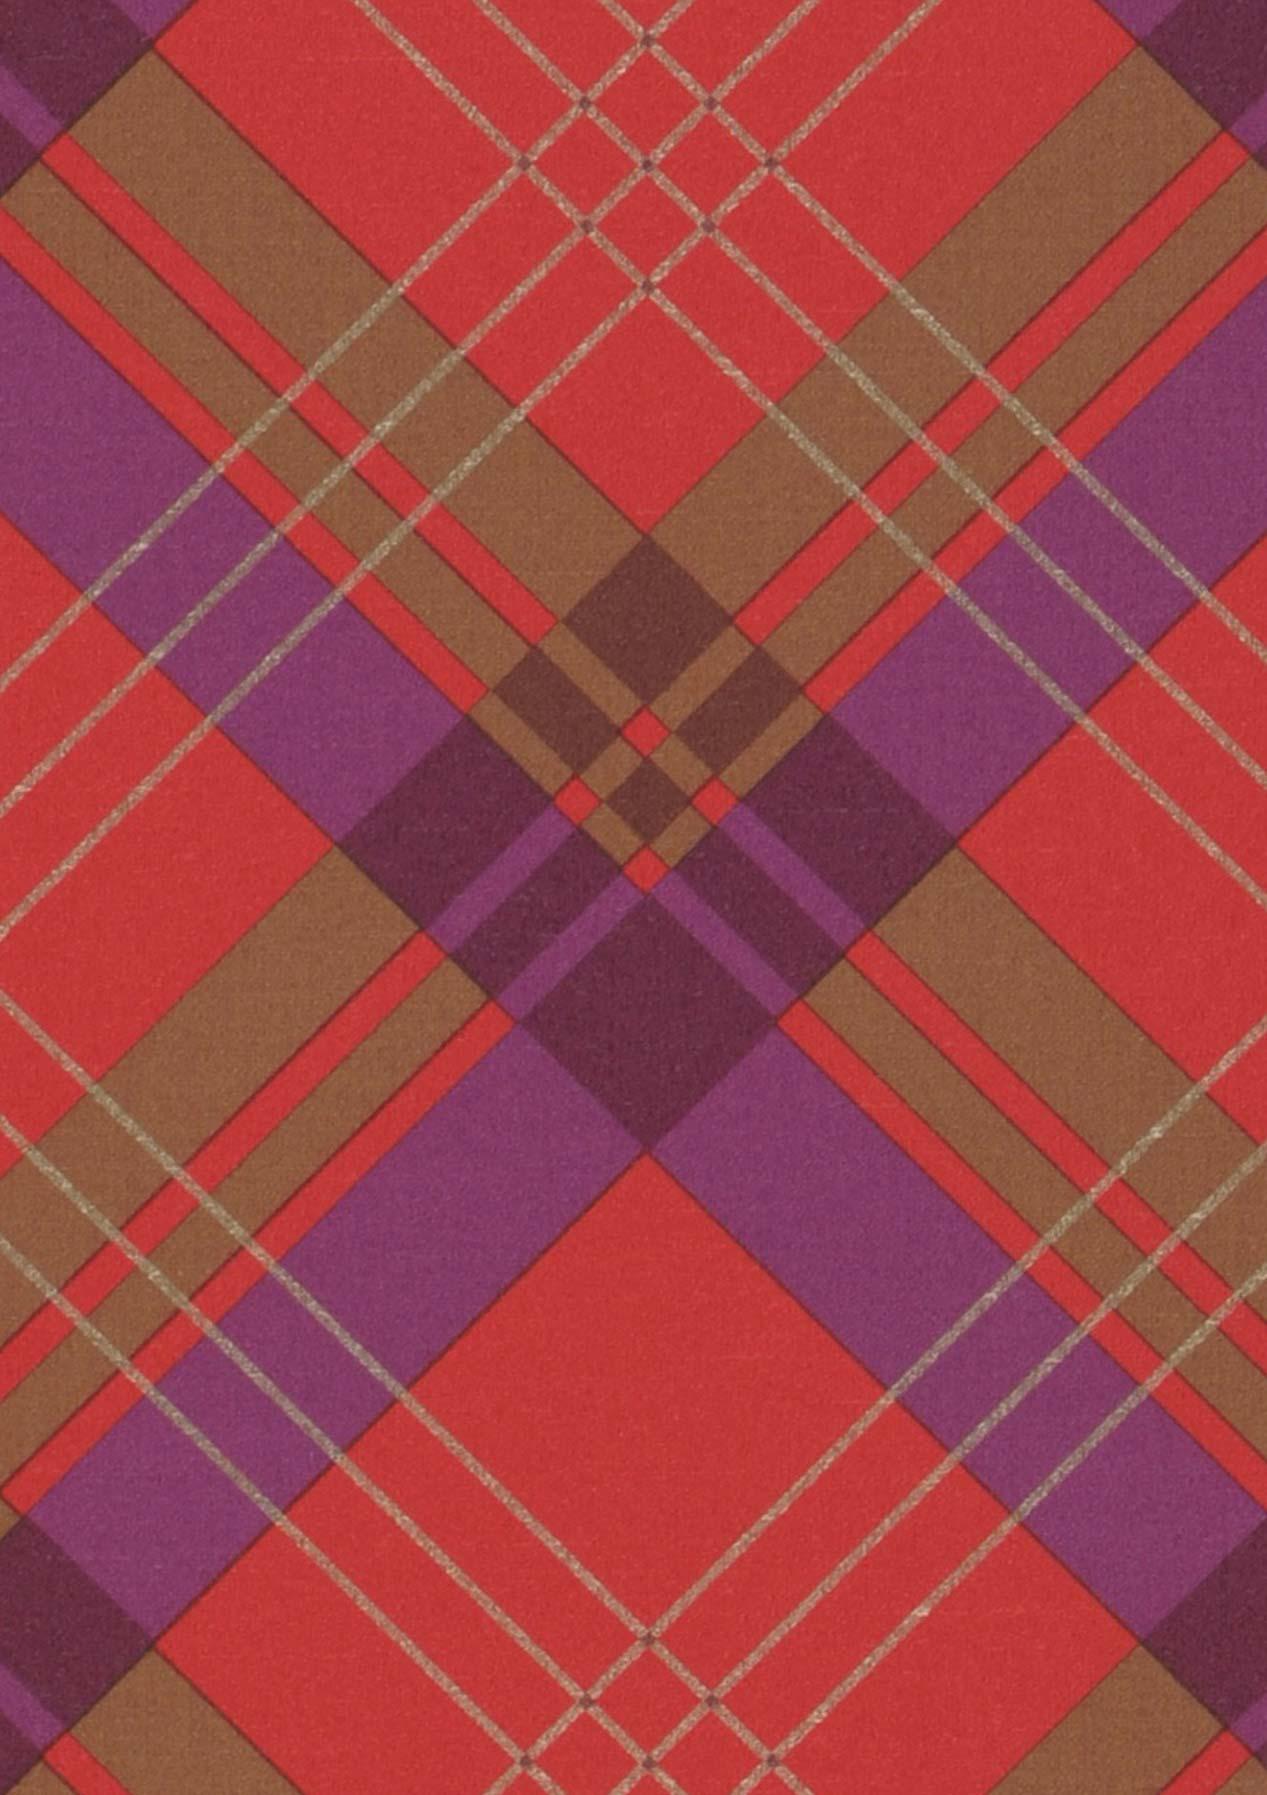 Tapete arristo blassbraun perlbeige rot violett for Tapete nach hause